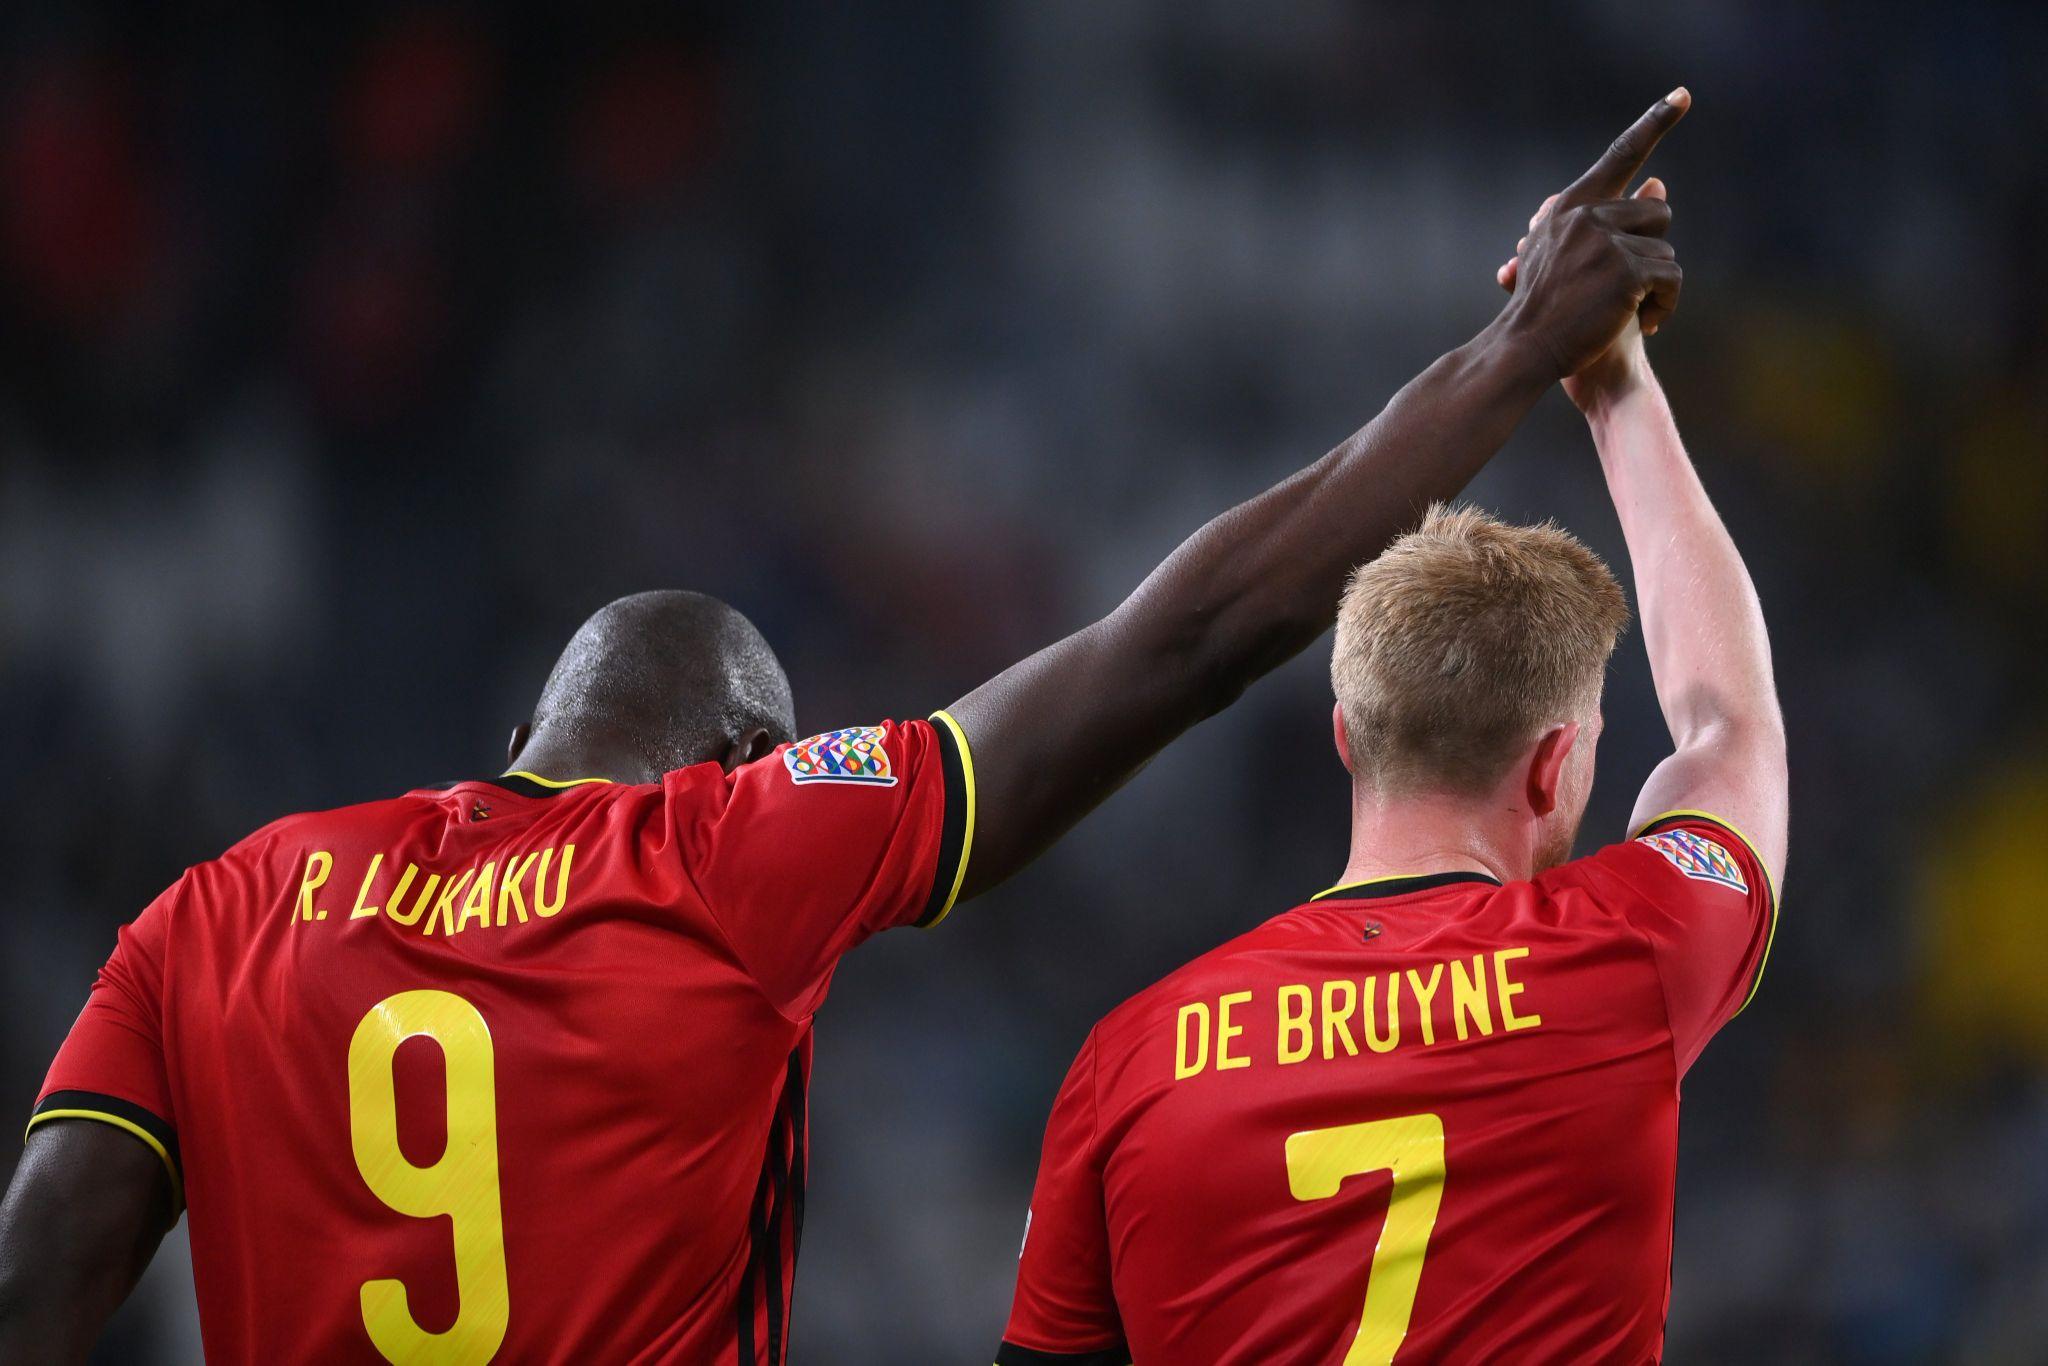 Romelu Lukaku and Kevin de Bruyne celebrate taking a 2-goal lead